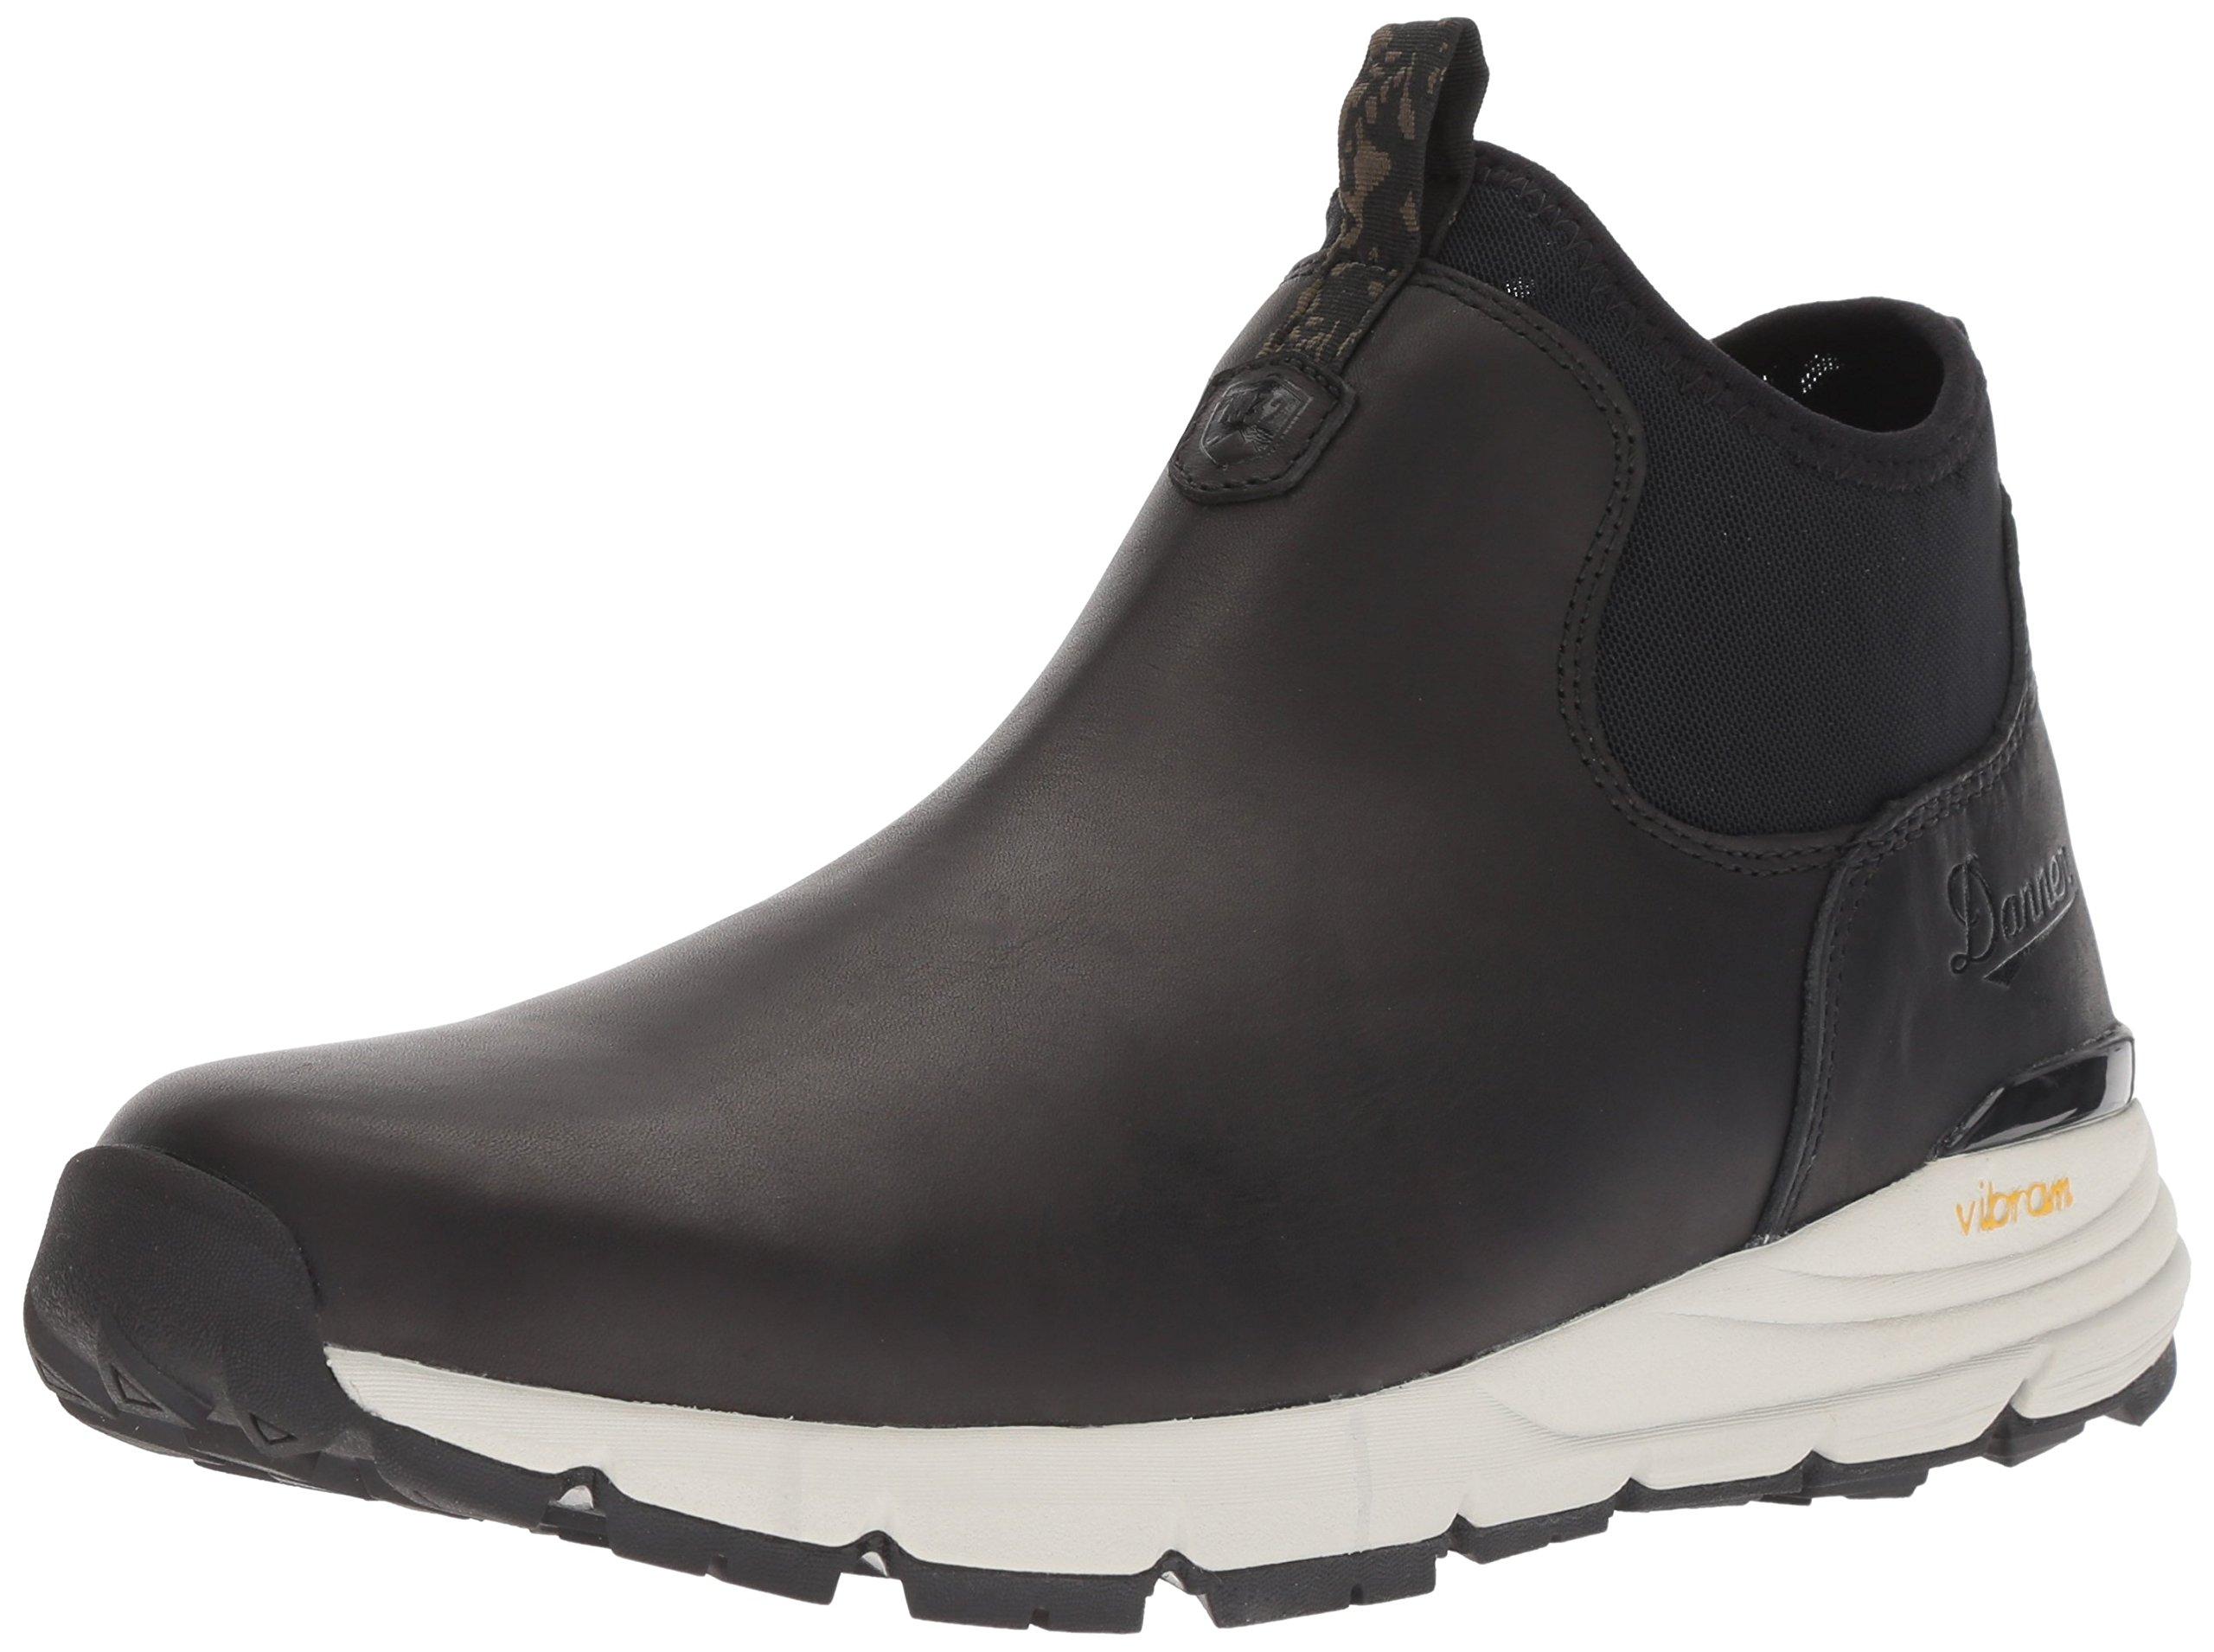 Danner Men's Mountain 600 Chelsea Boot, Black, 9.5 D US